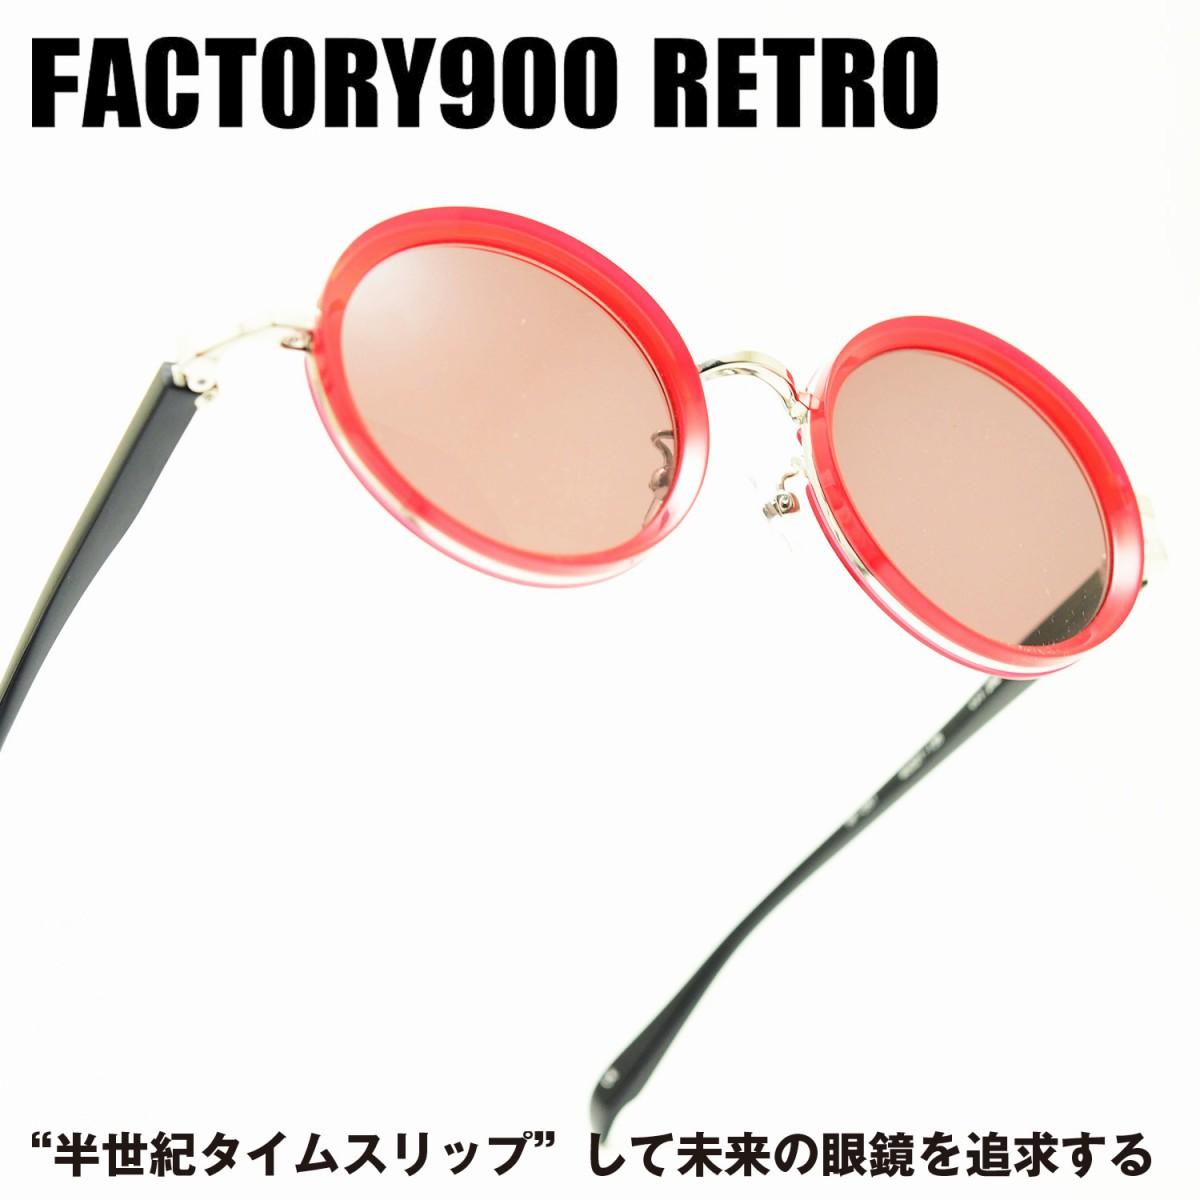 FACTORY900 RETRO ファクトリー900レトロRF-051 col-282